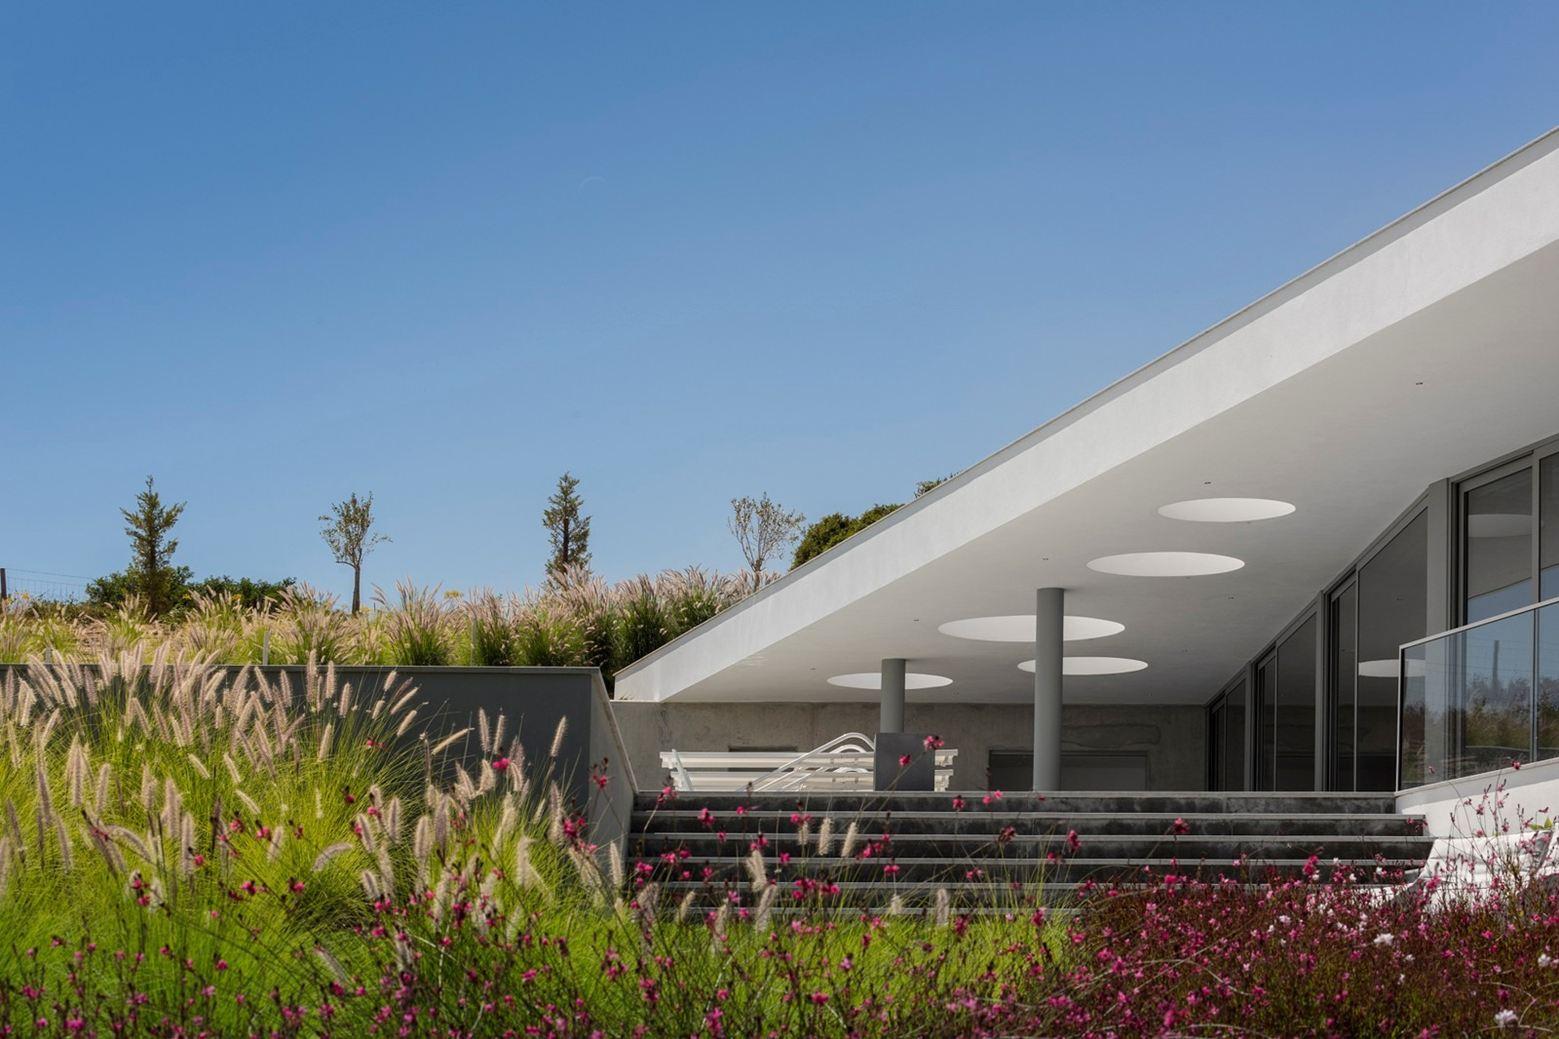 Casa Zauia in Lagos, Portugal by Mario Martins Atelier